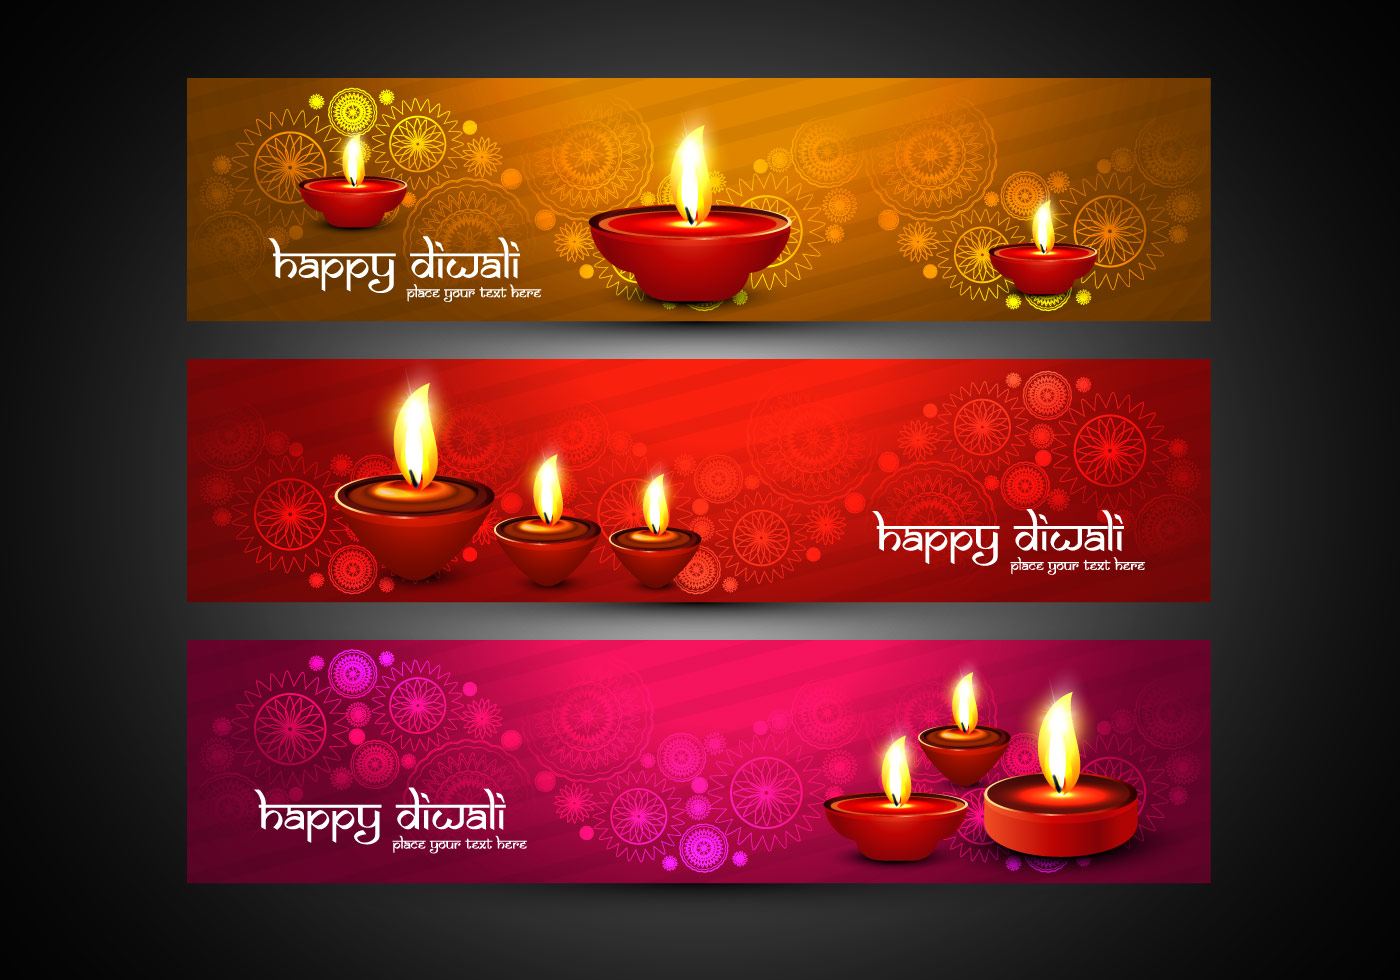 diwali background free vector art 25893 free downloads